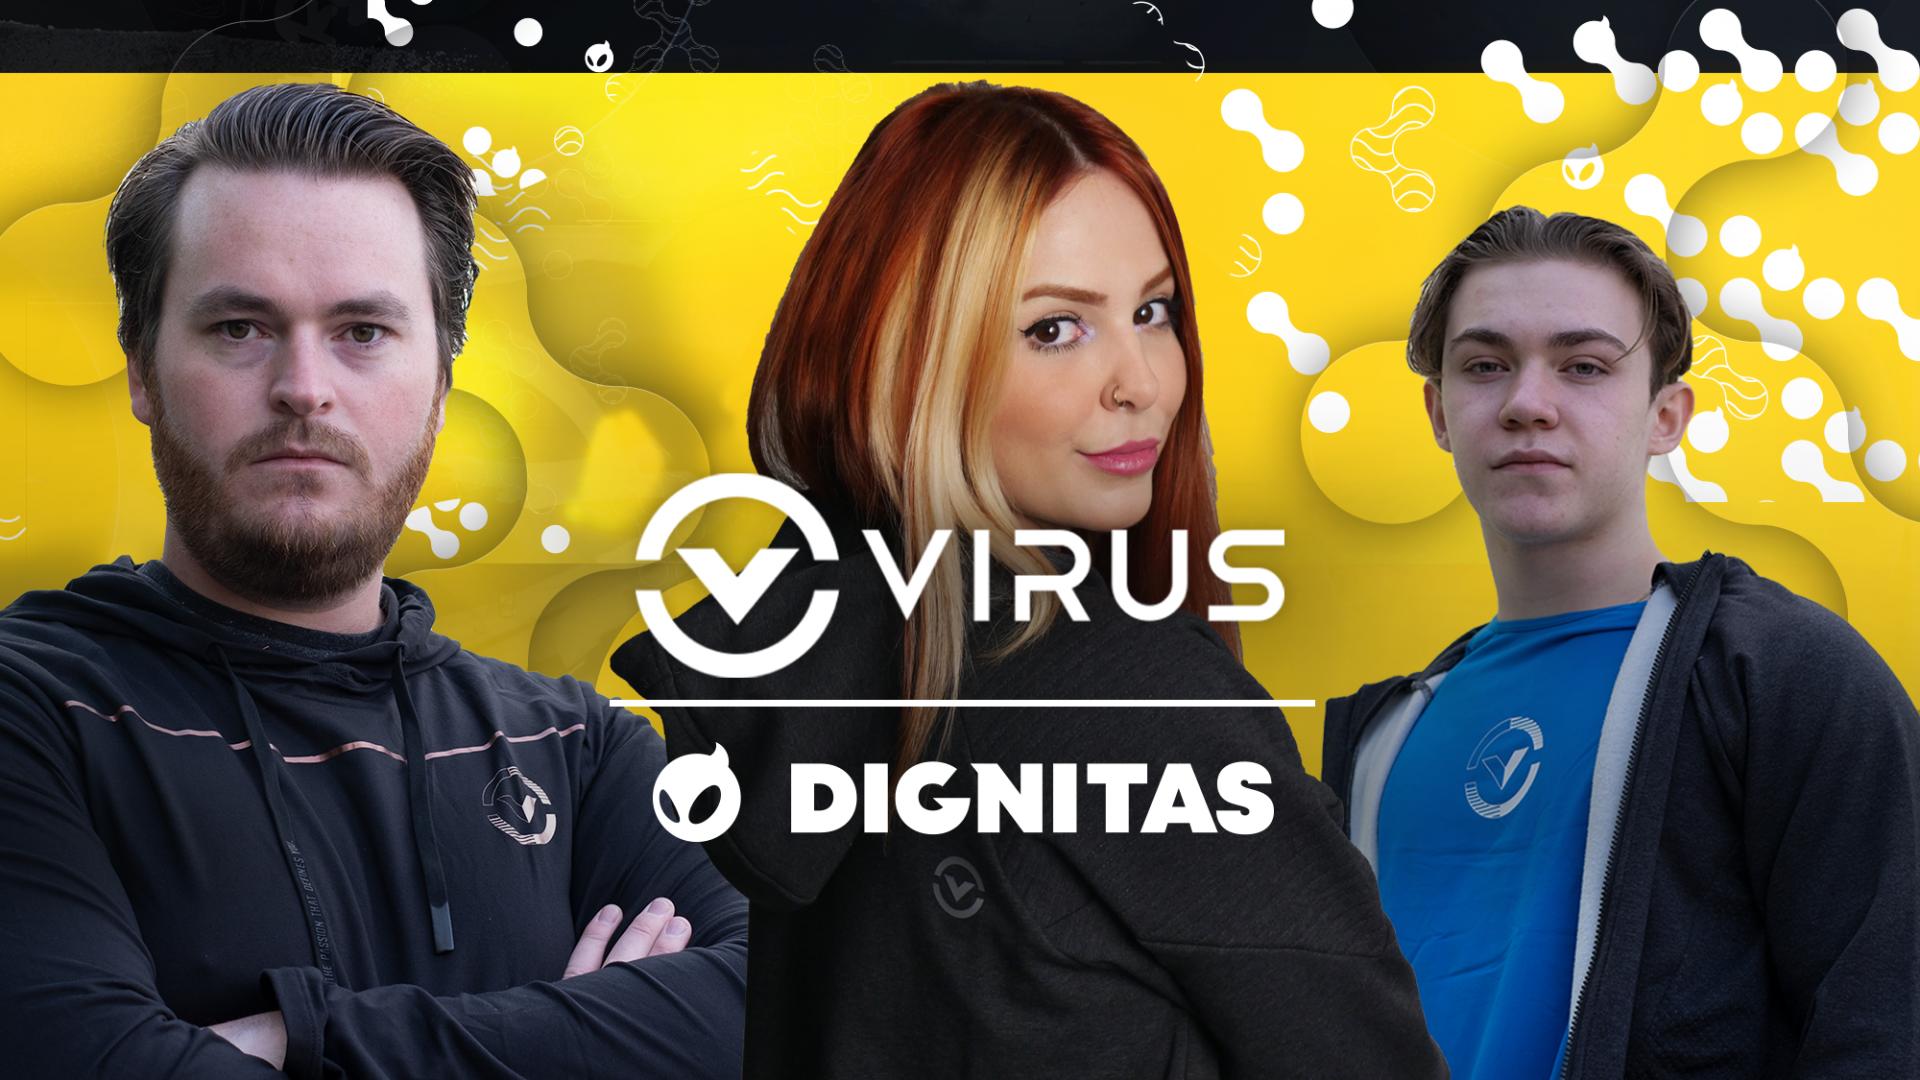 Dignitas launches apparel collaboration with VIRUS International thumbnail